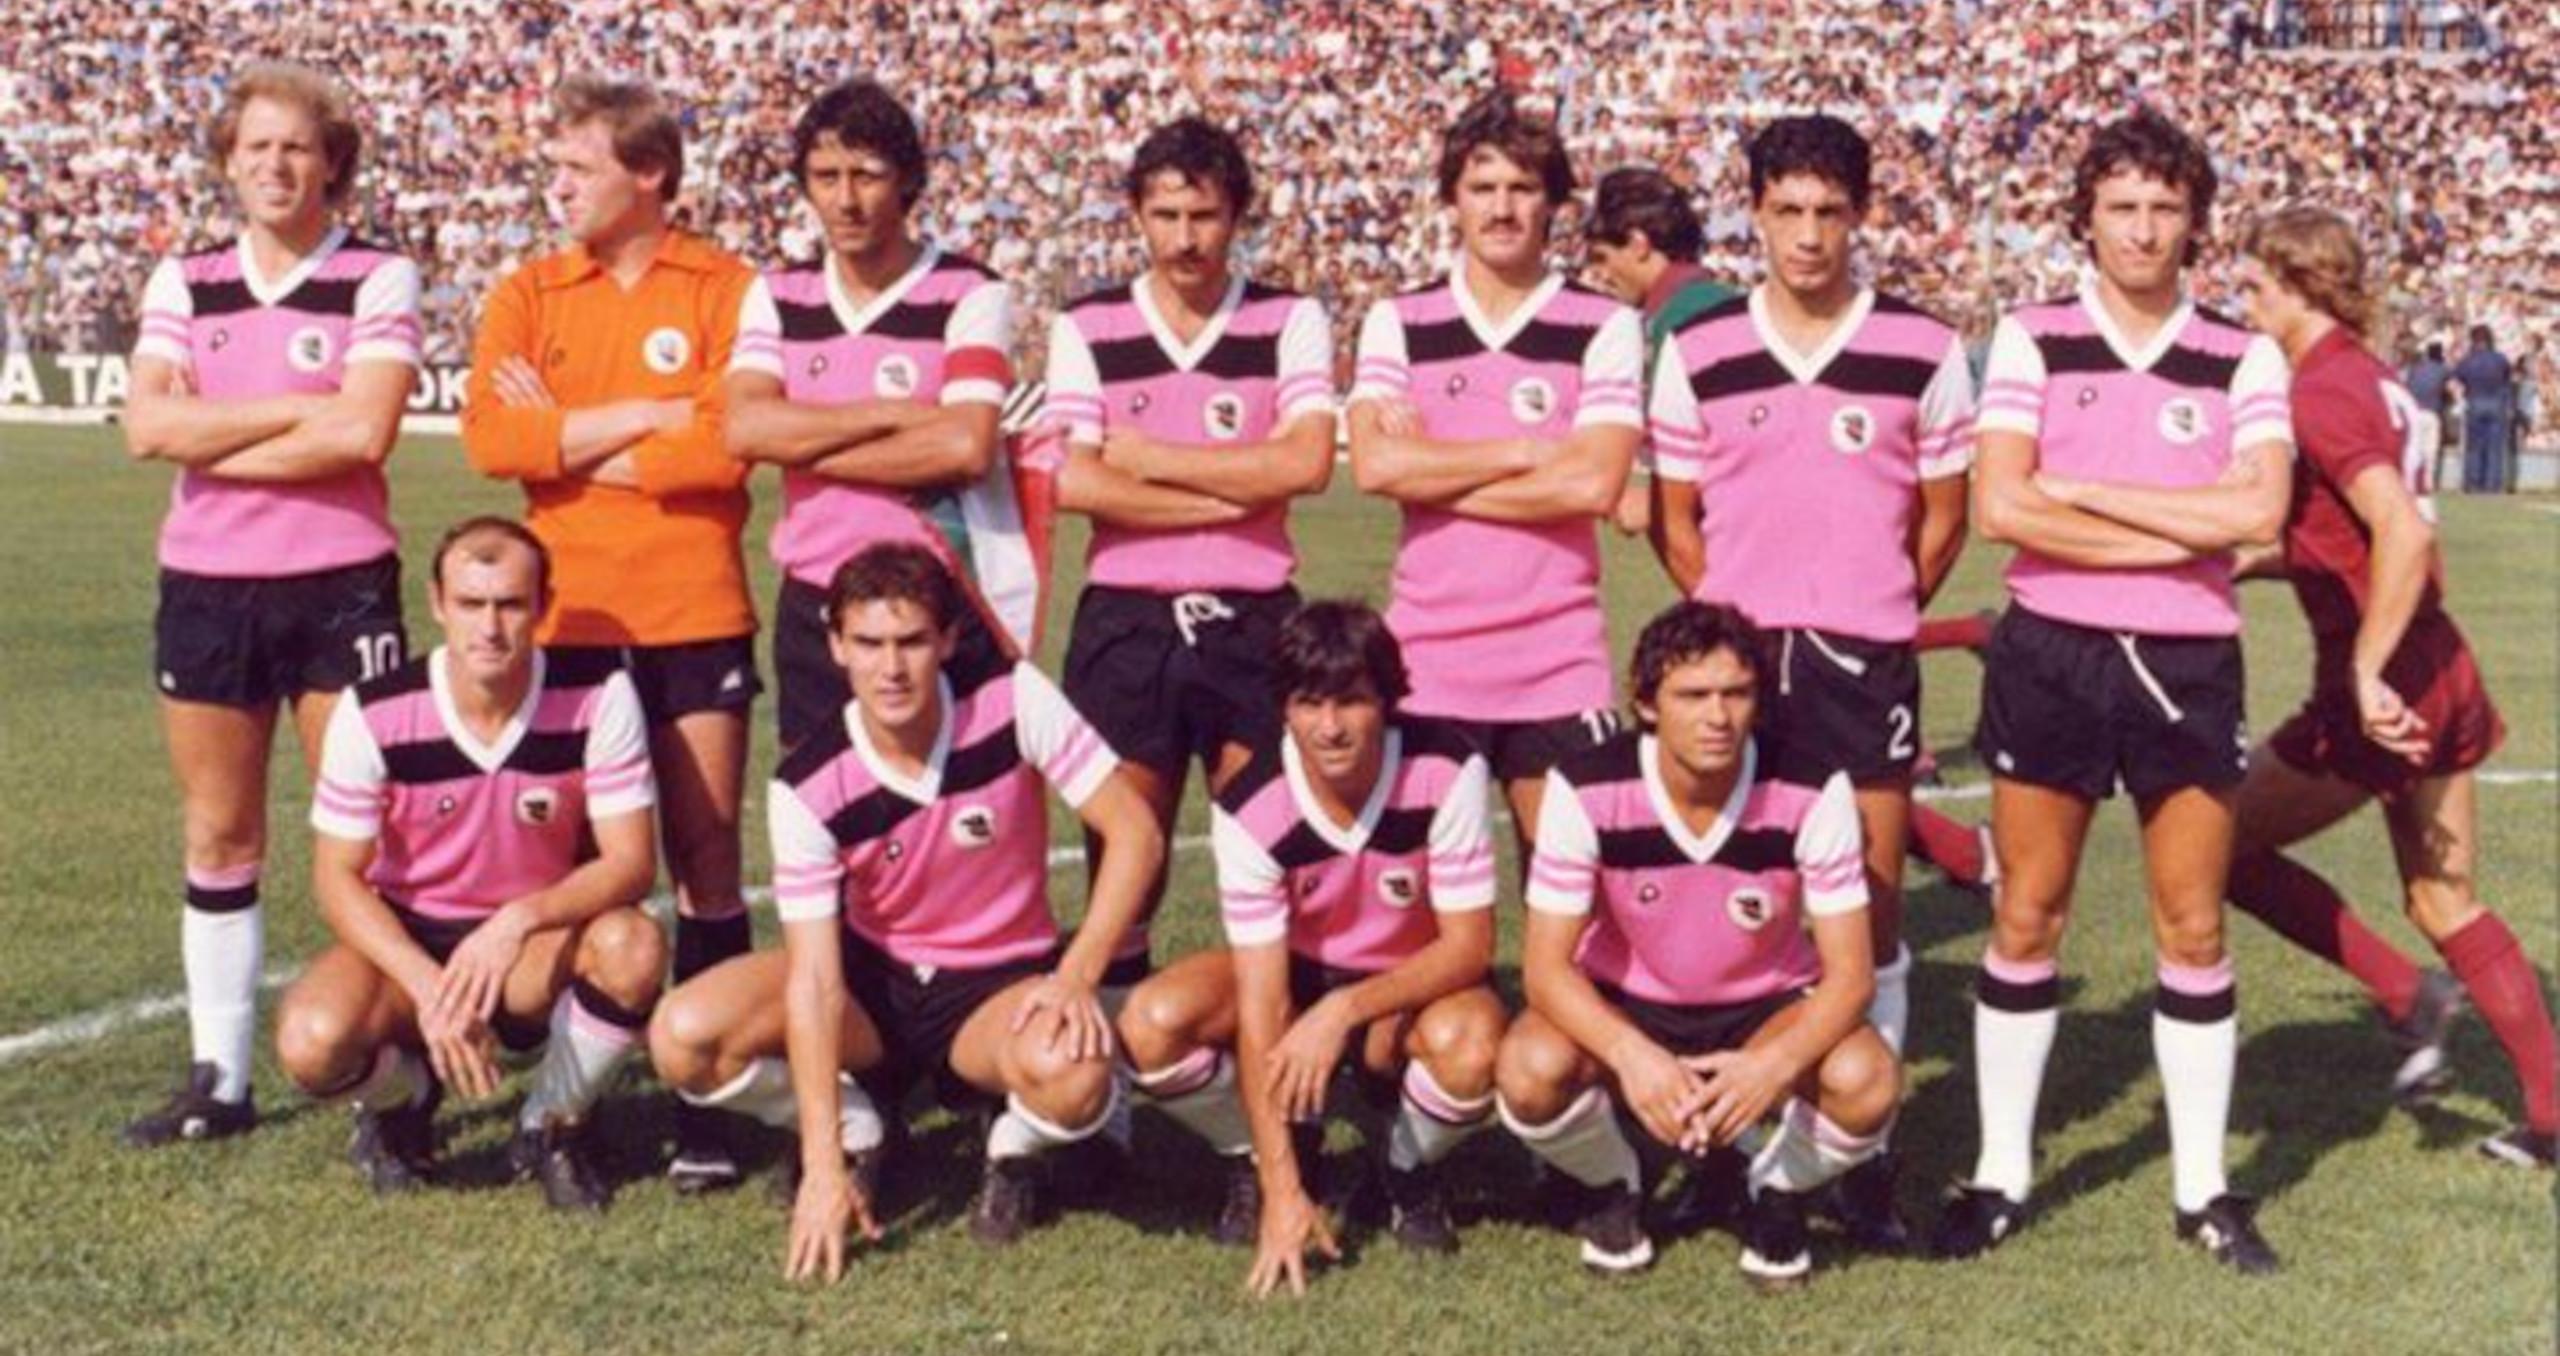 US Palermo 1979-1980